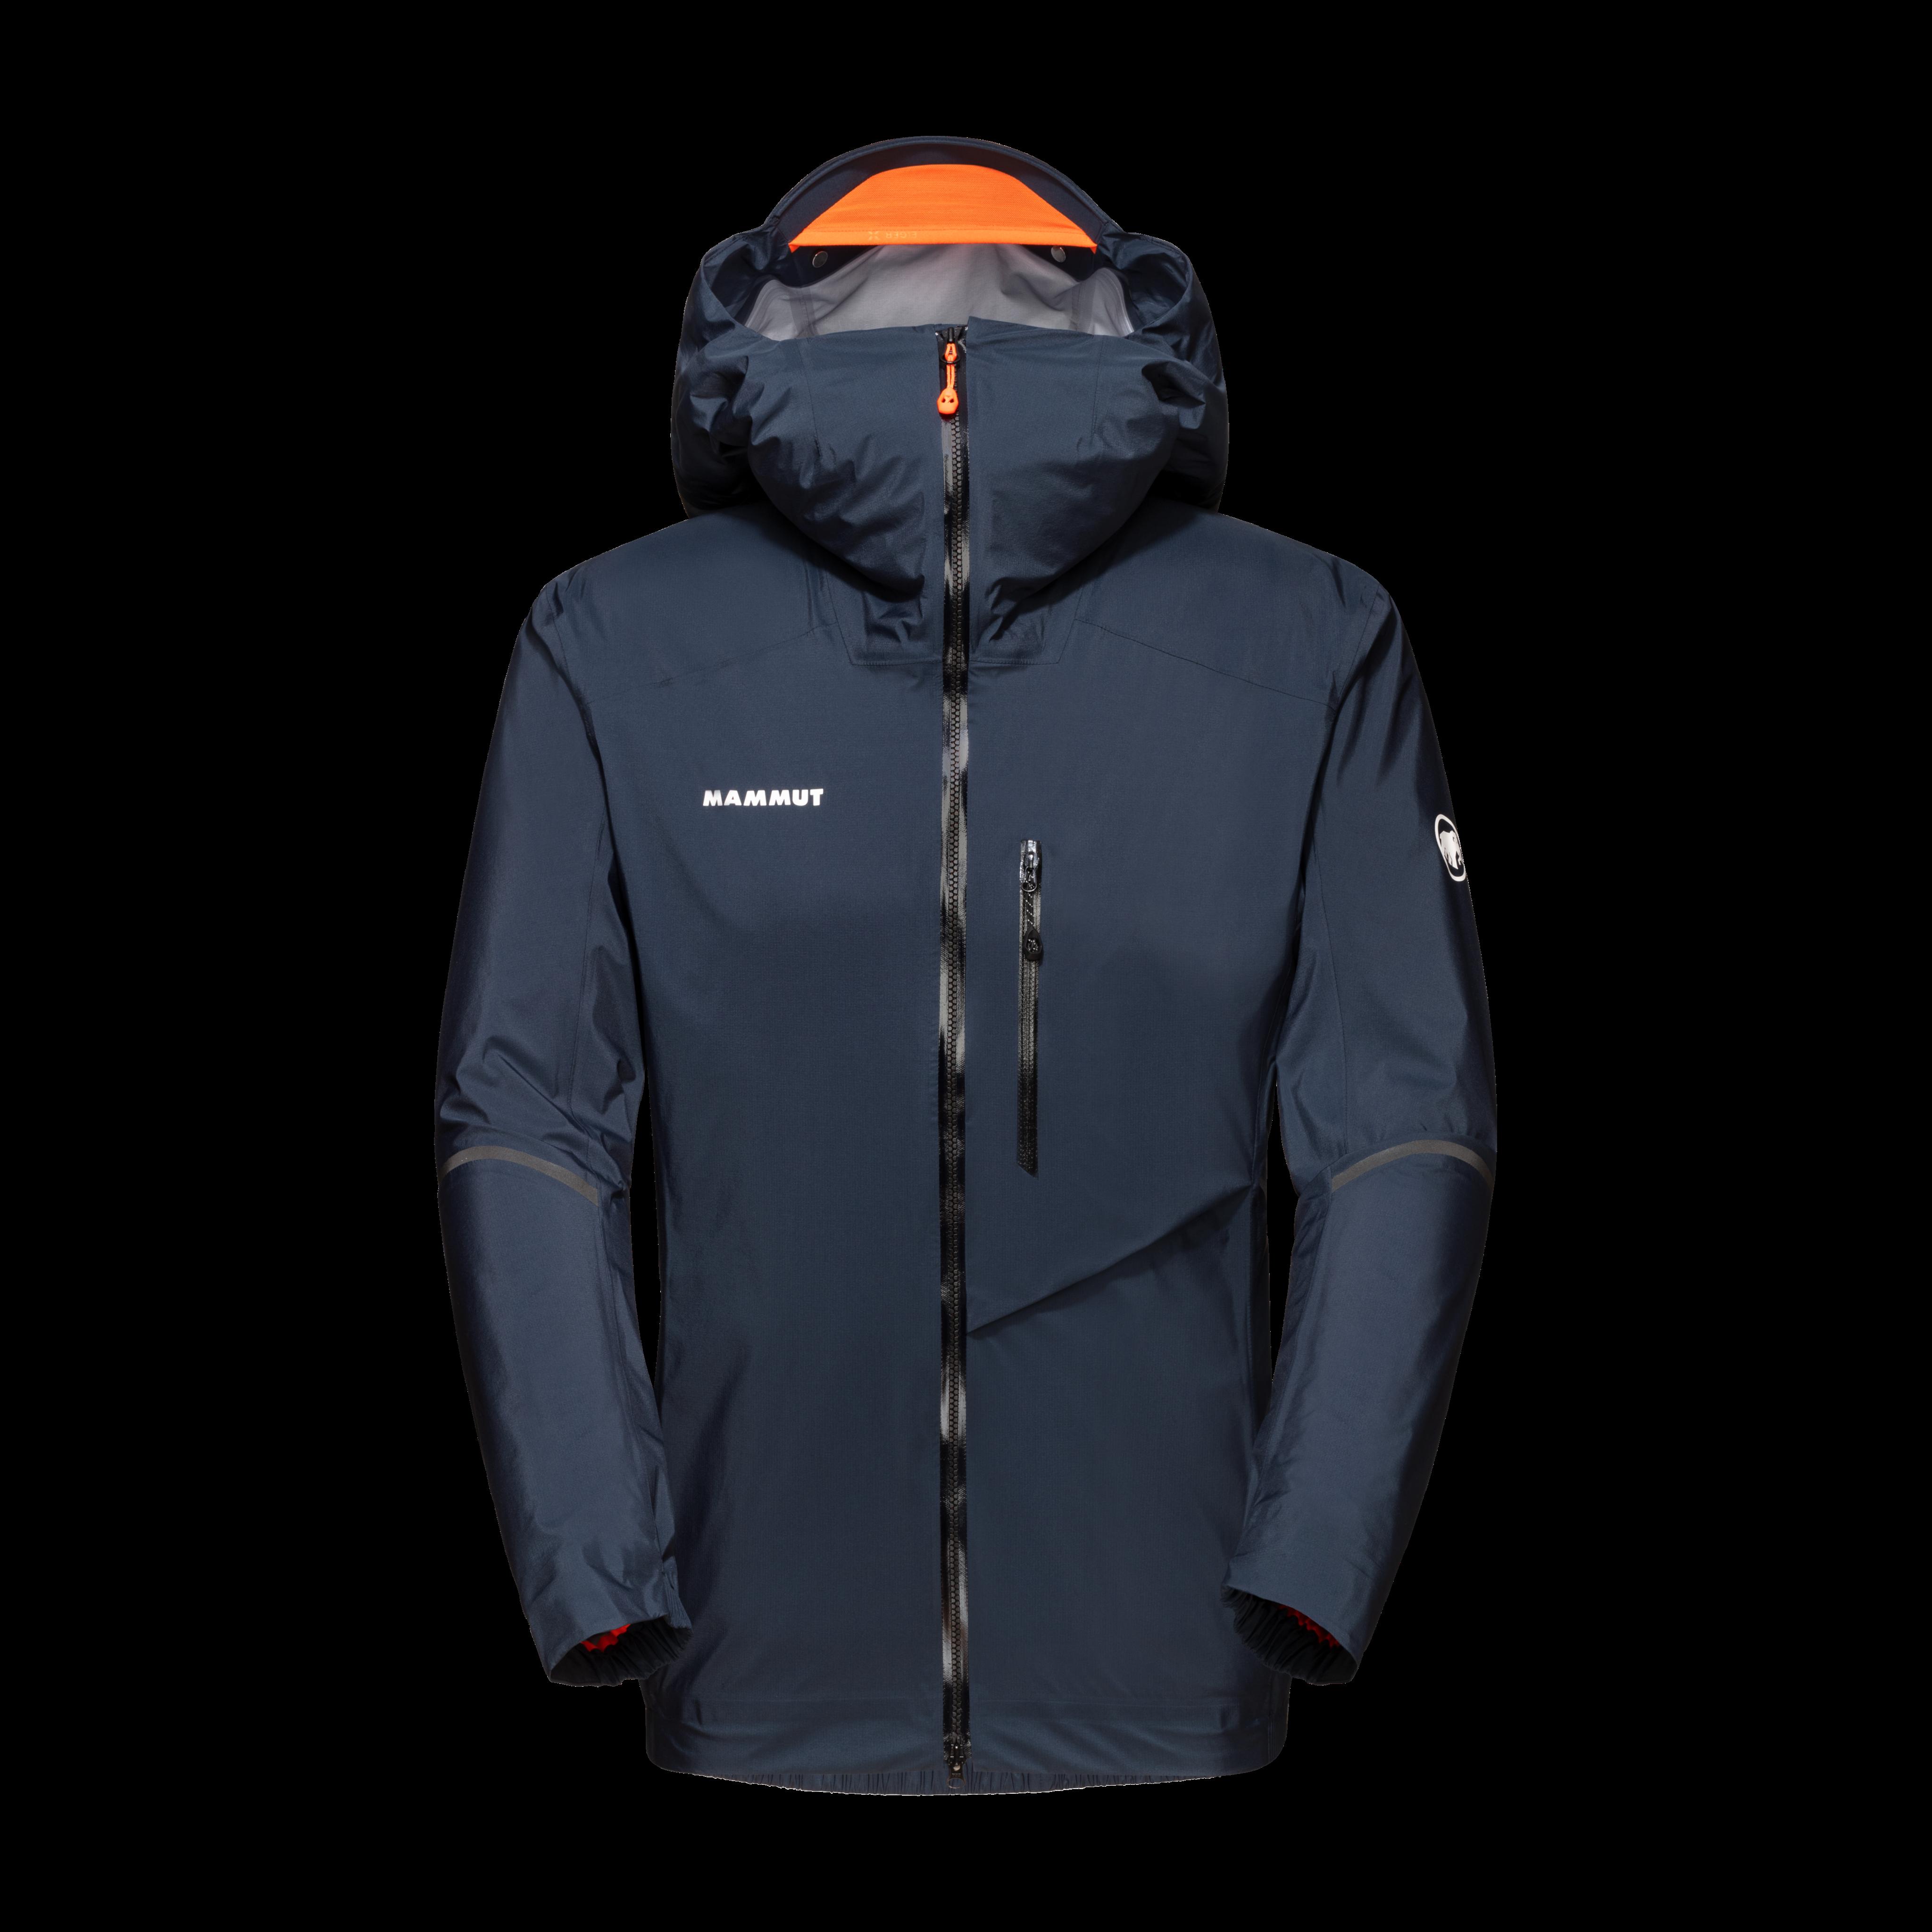 Nordwand Light HS Hooded Jacket Men - M, night thumbnail